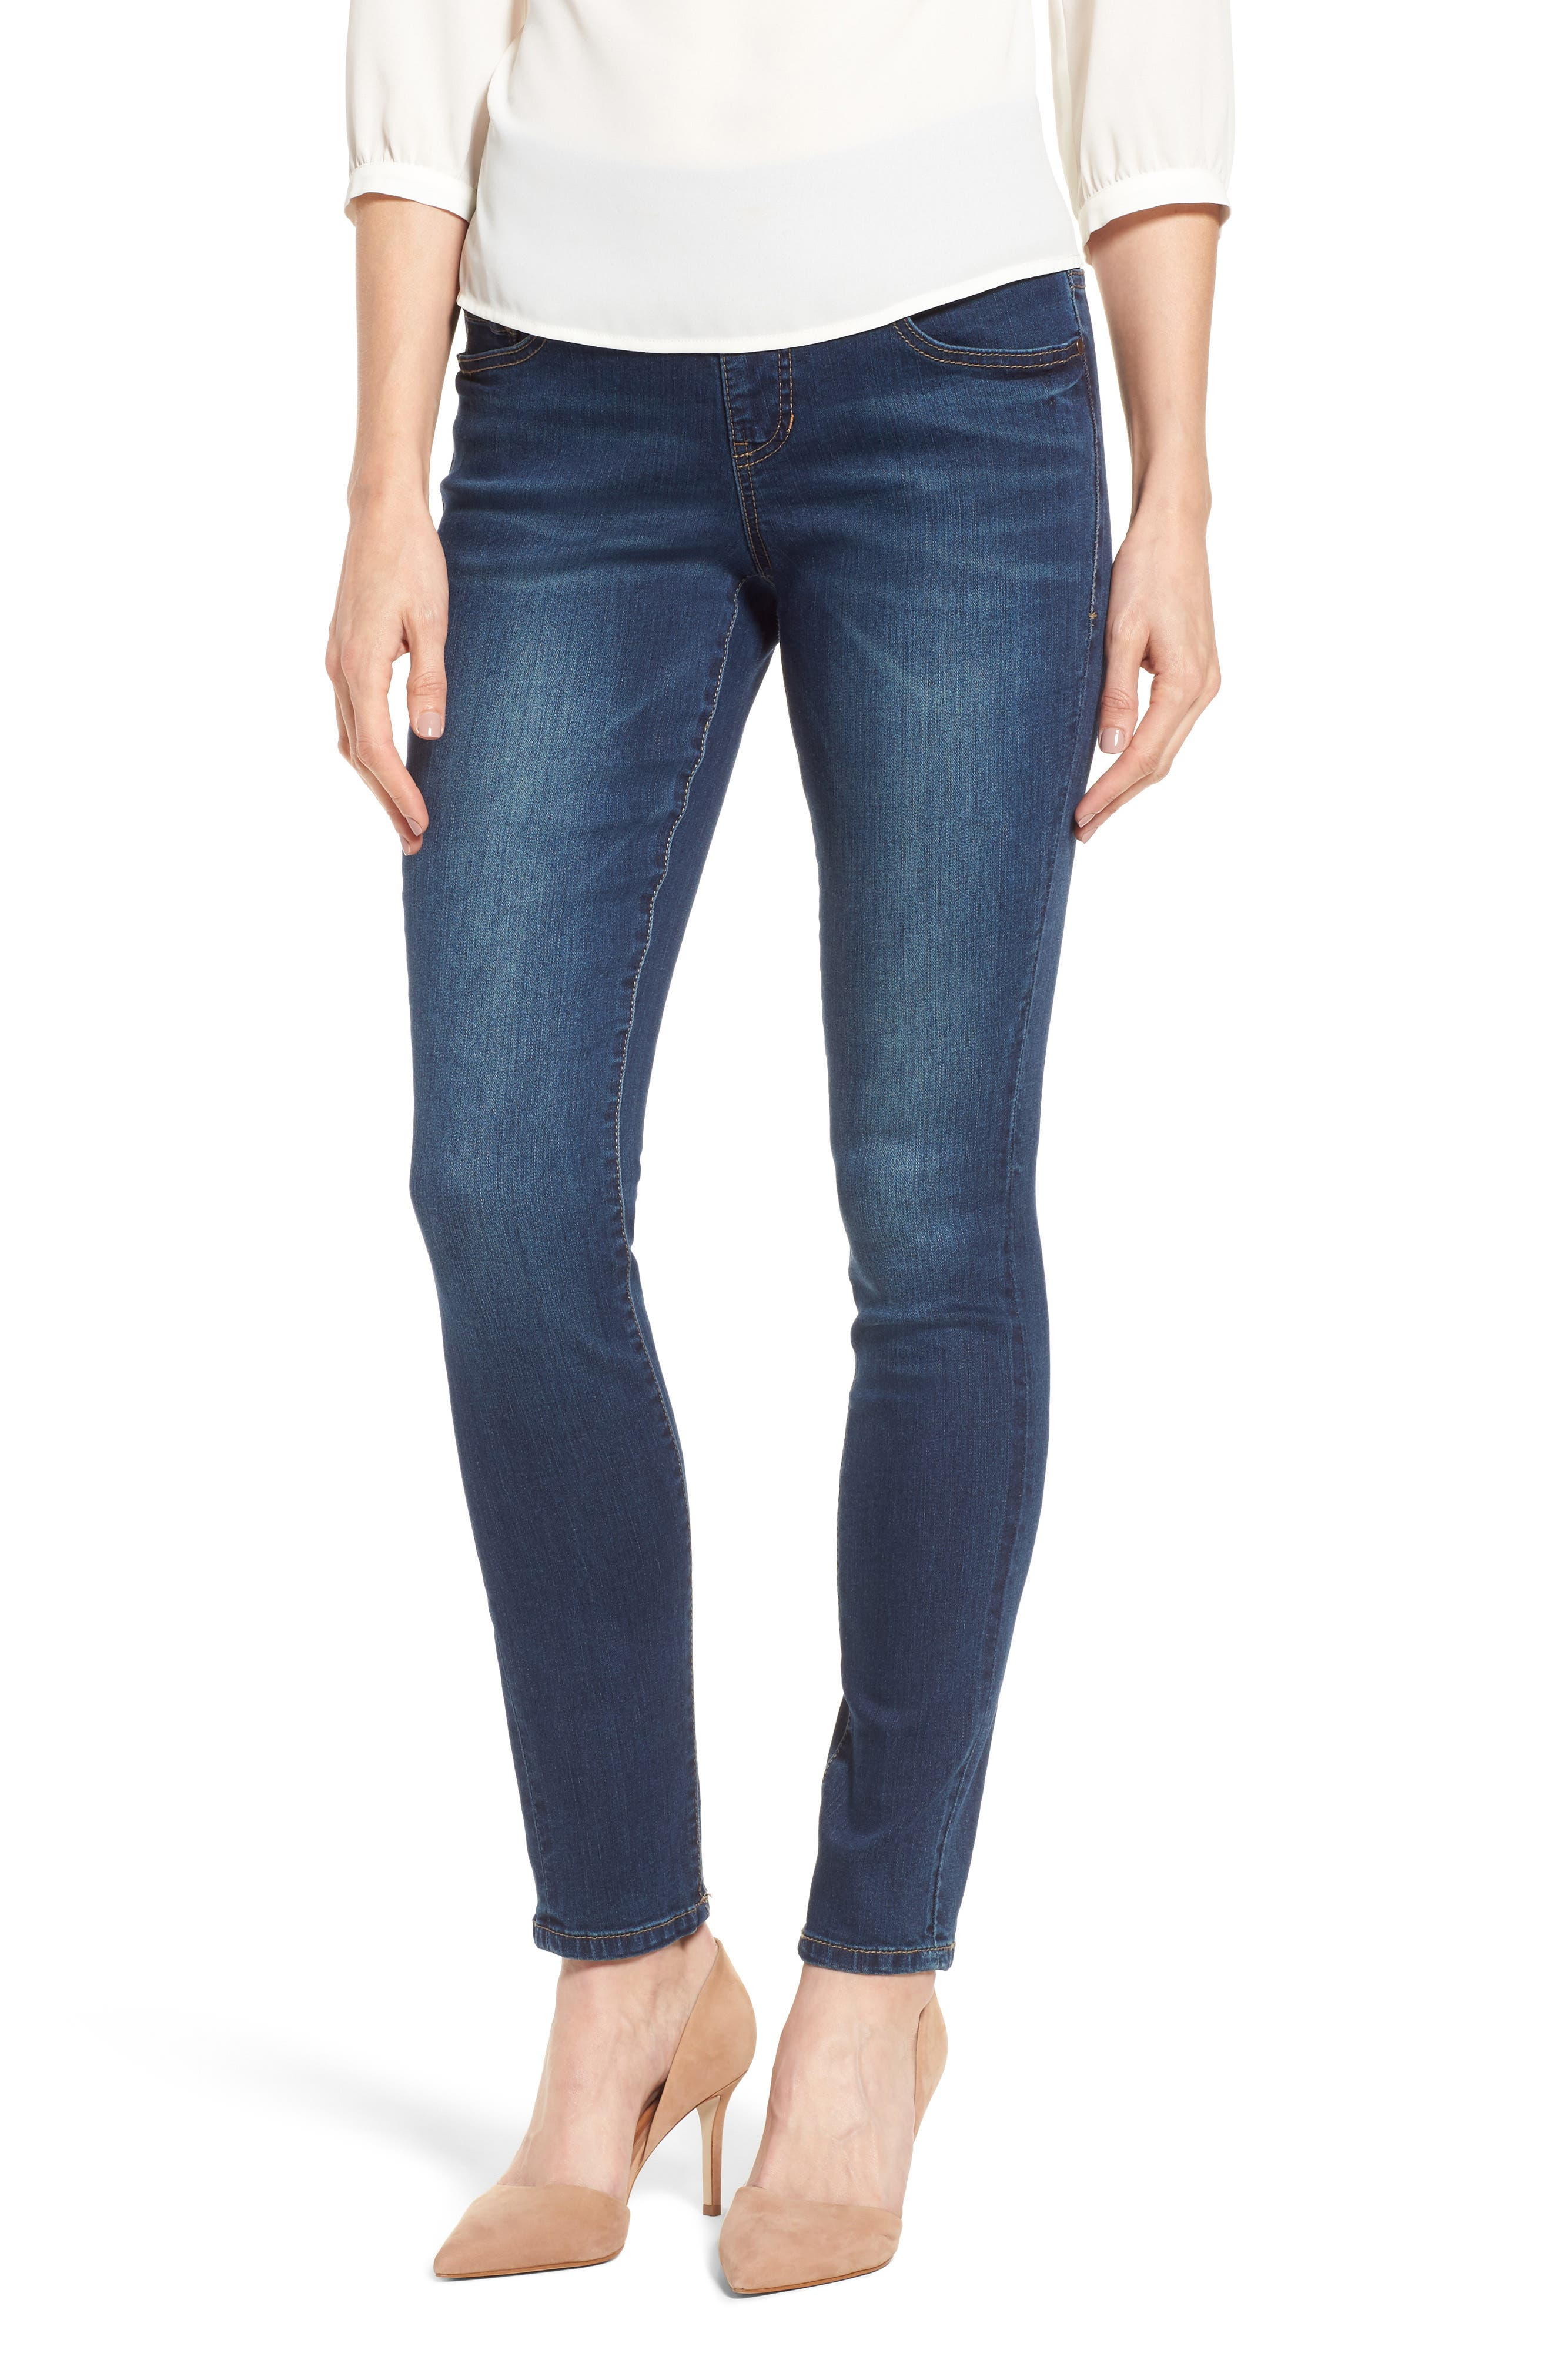 Alternate Image 1 Selected - Jag Jeans Nora Stretch Skinny Jeans (Regular & Petite)